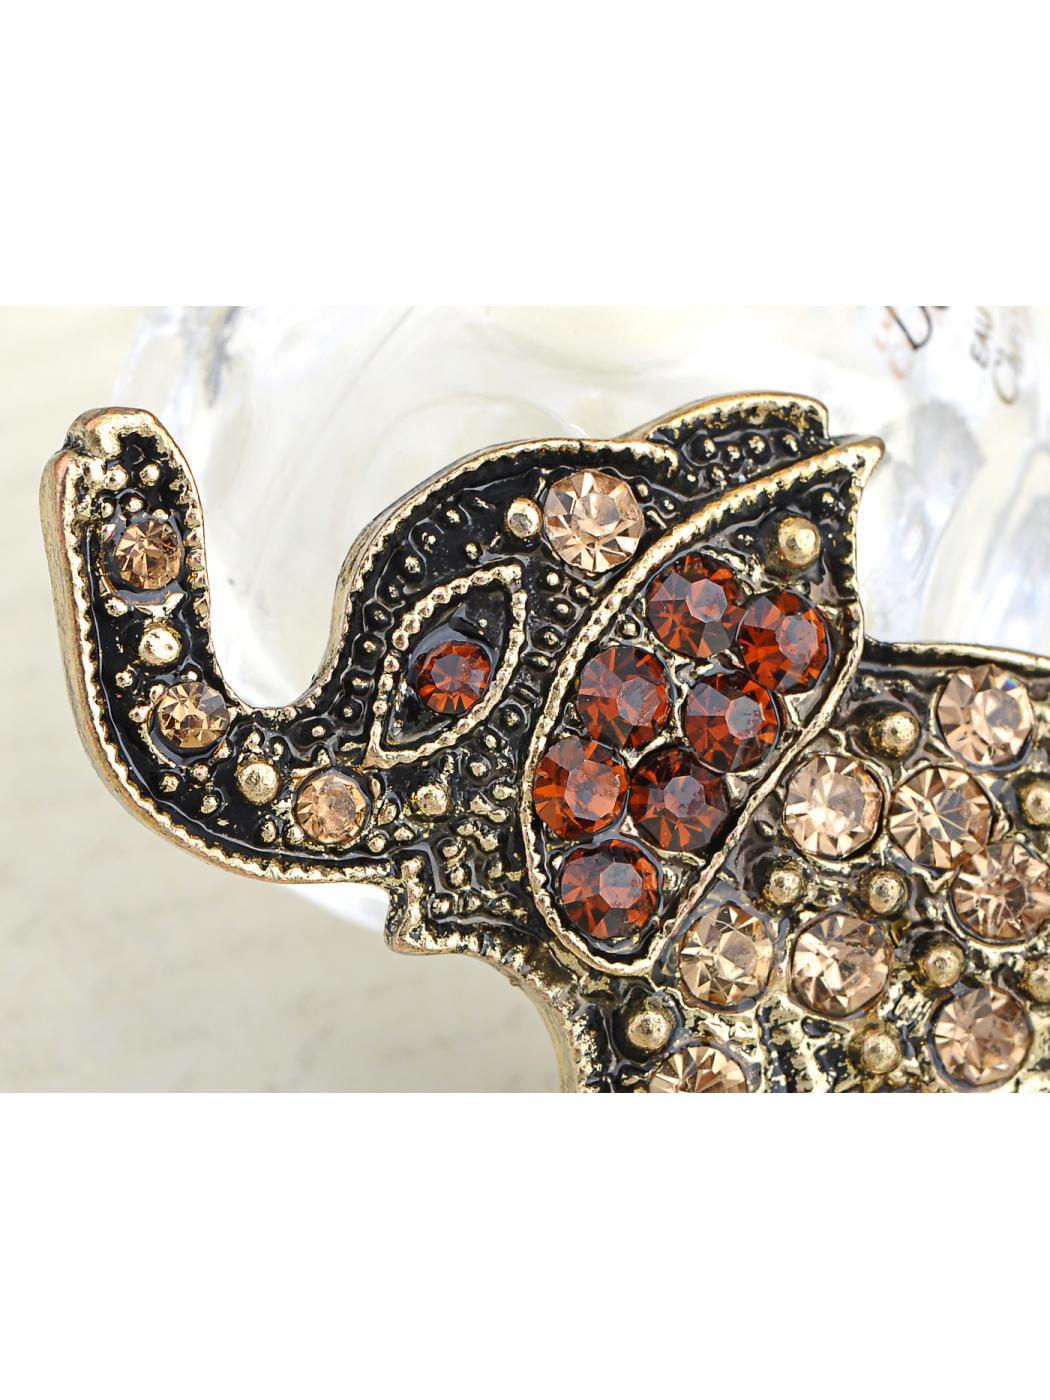 Antique-Inspired Bronze Brass Tone Topaz Crystal Rhinestone Elephant Pin Brooch by